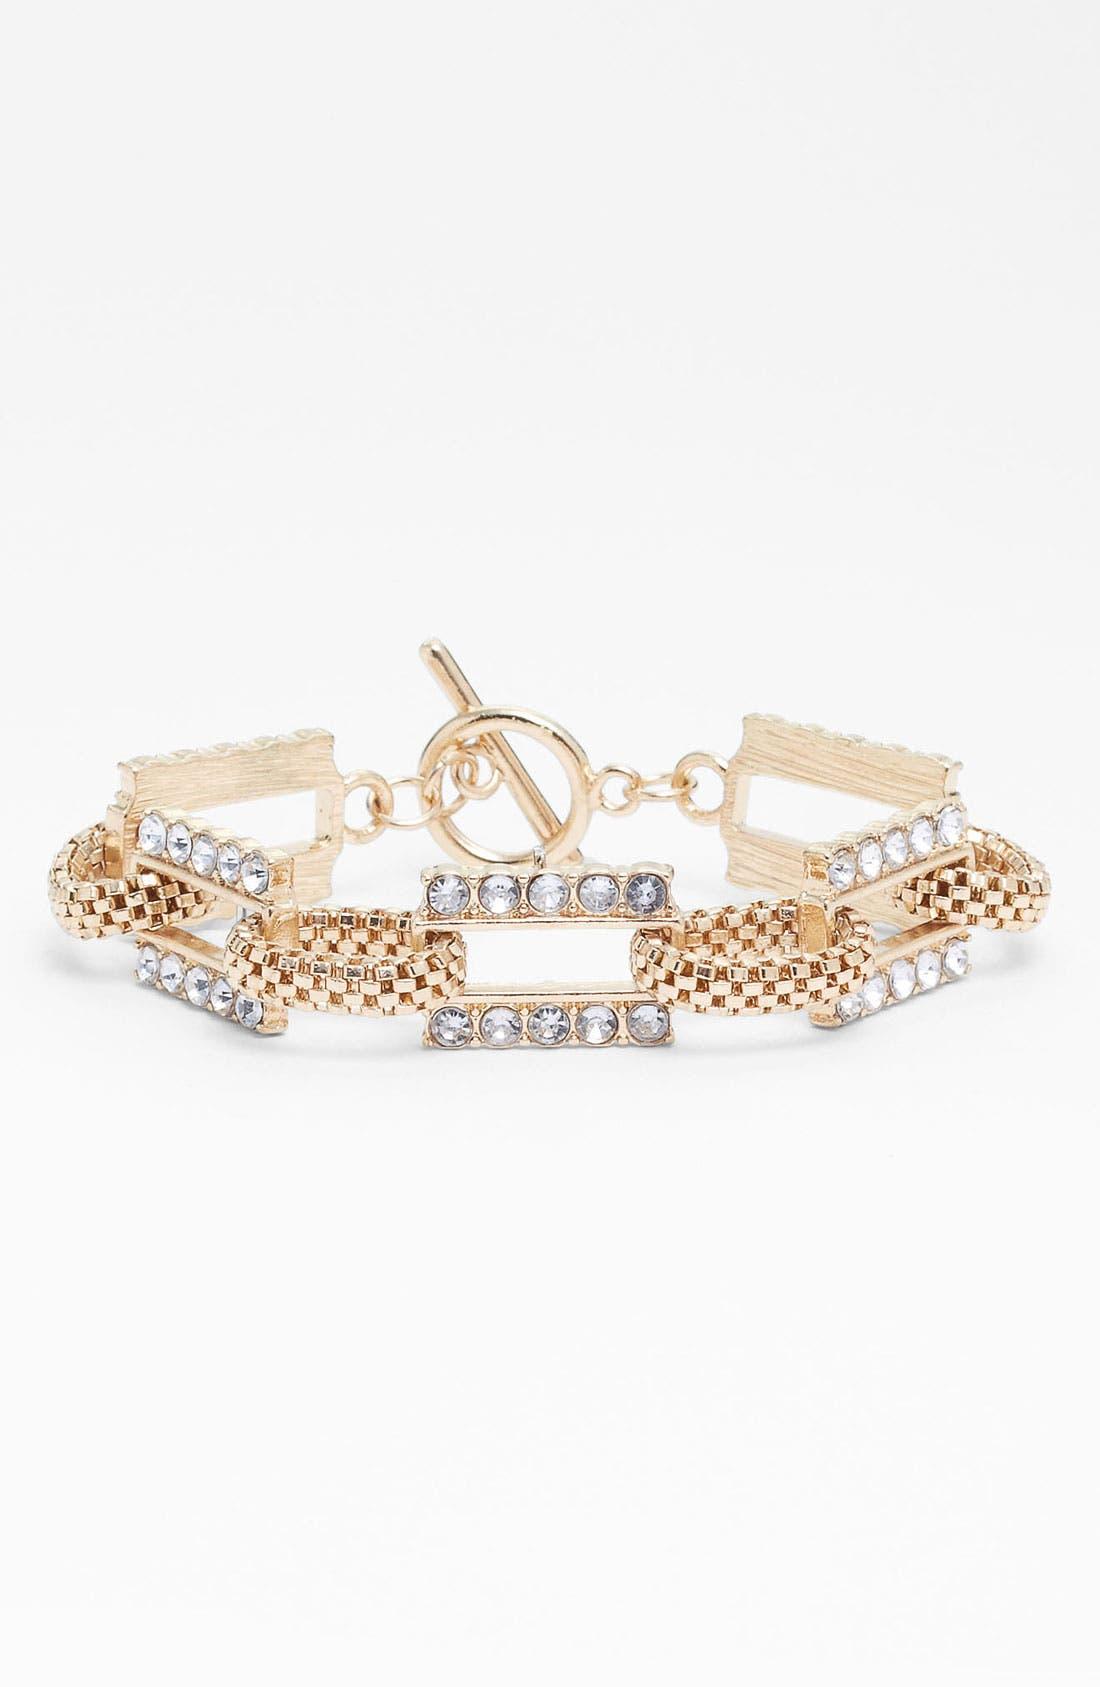 Main Image - Carole Rhinestone & Chain Link Bracelet